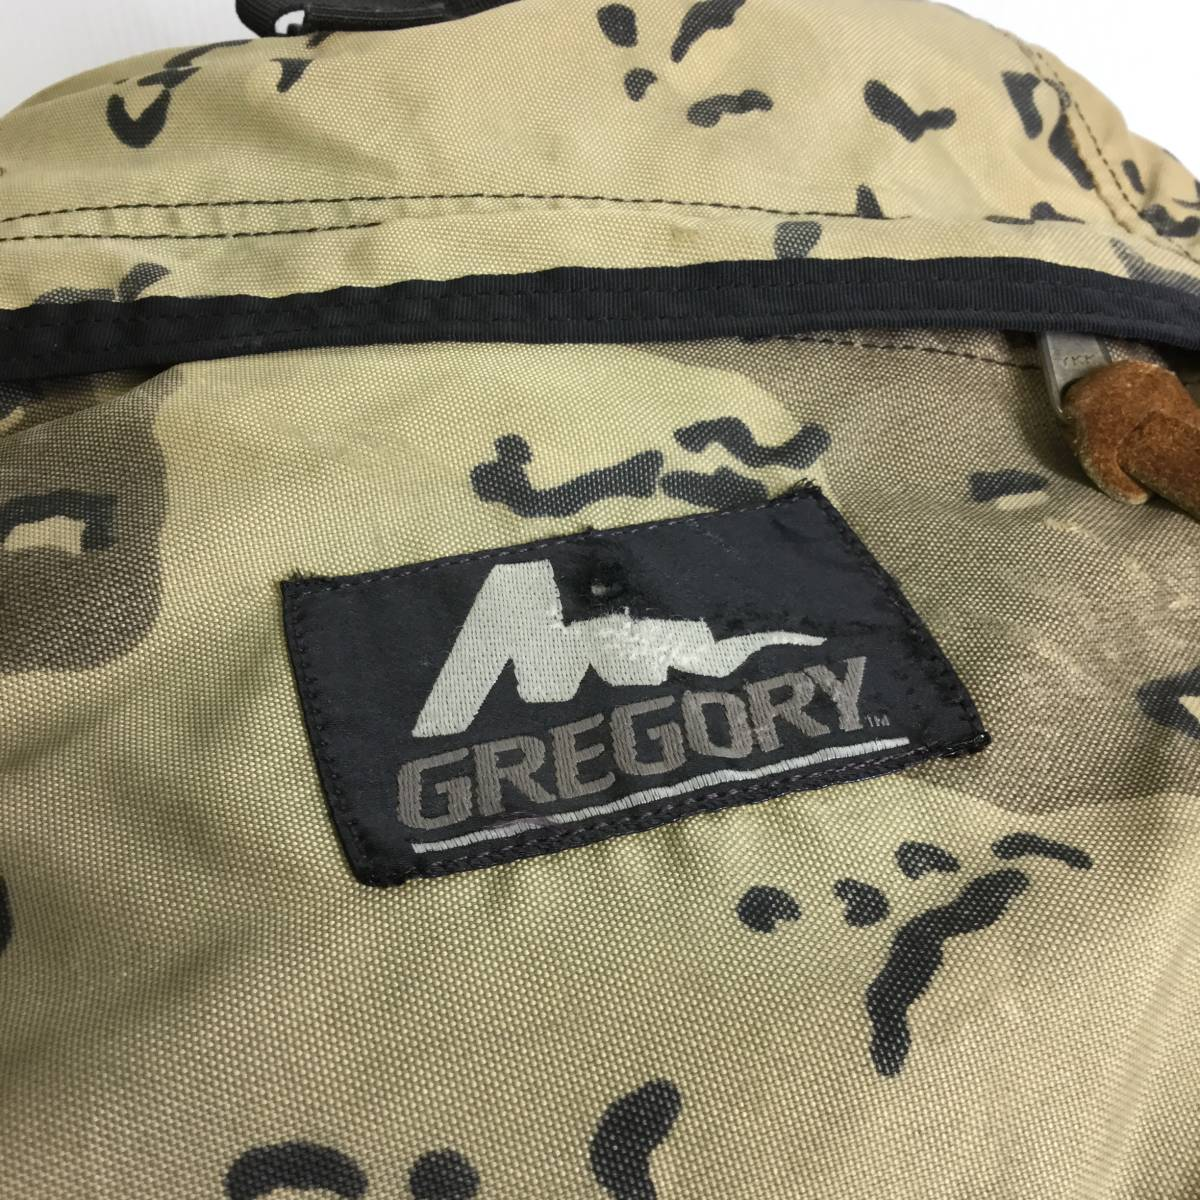 90s USA製 グレゴリー デイパック チョコチップカモ 迷彩 旧タグ GREGORY リュック